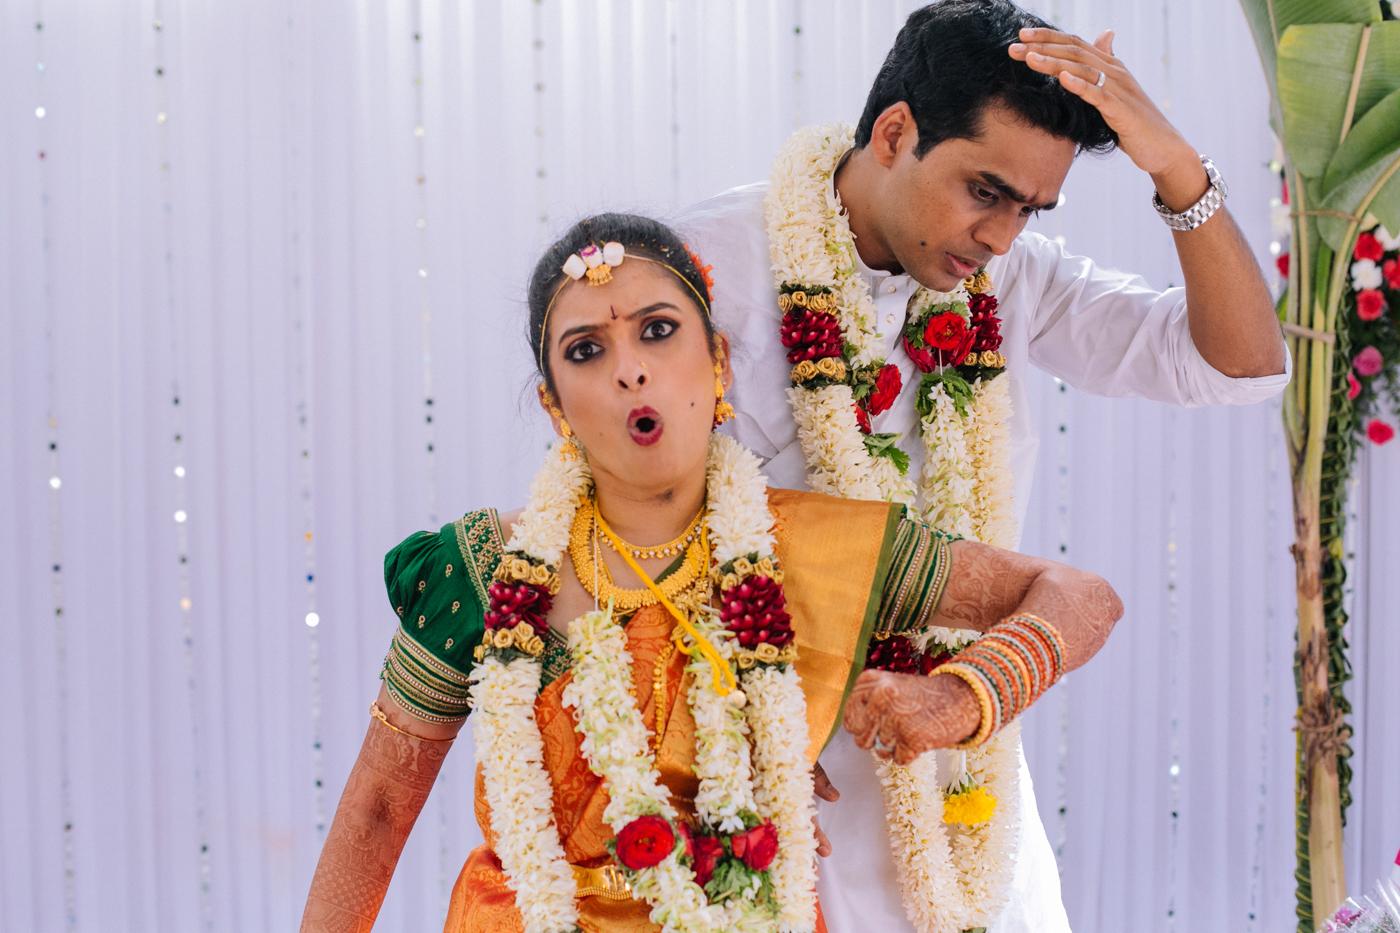 Naian & Saagar - Fun Wedding & Temple Tree